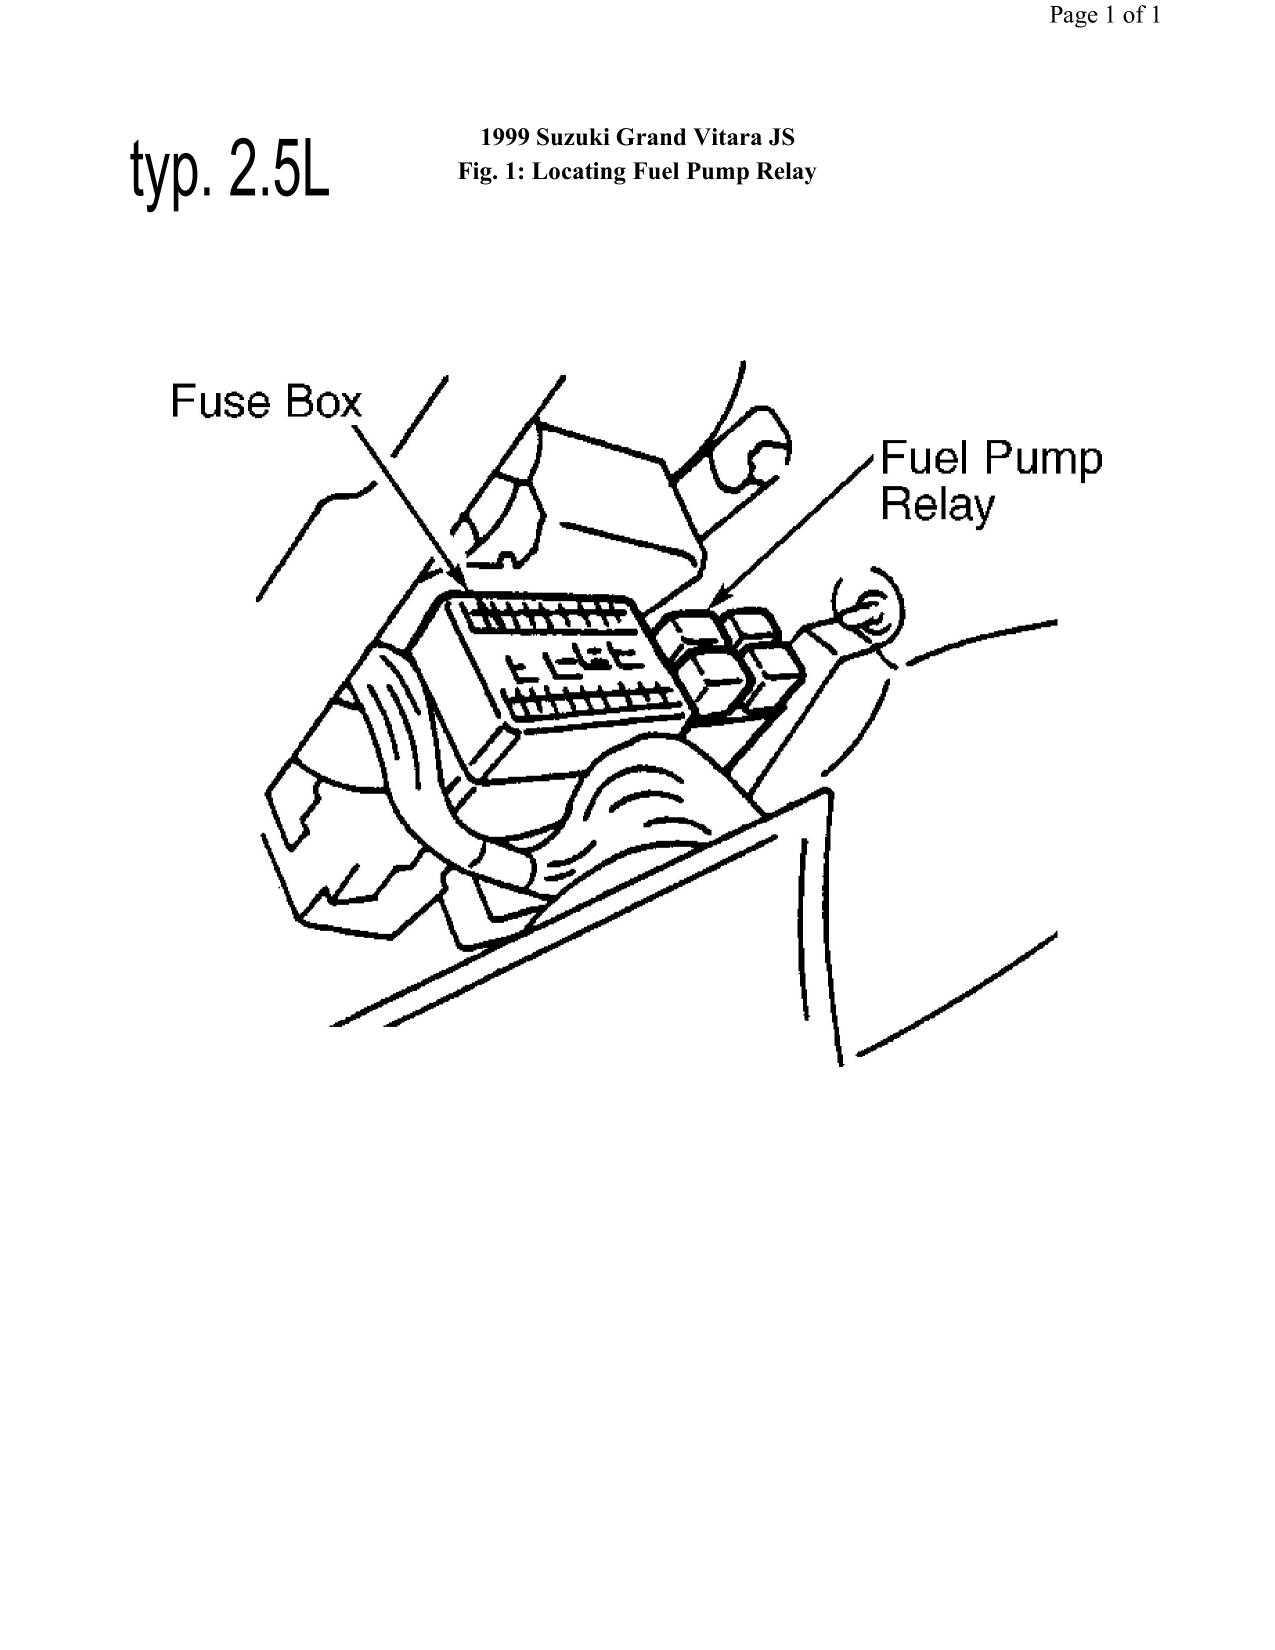 hight resolution of 1999 suzuki vitara fuse diagram wiring diagrams schema rh 35 verena hoegerl de 1999 suzuki grand vitara fuse box diagram 1999 suzuki vitara fuse box